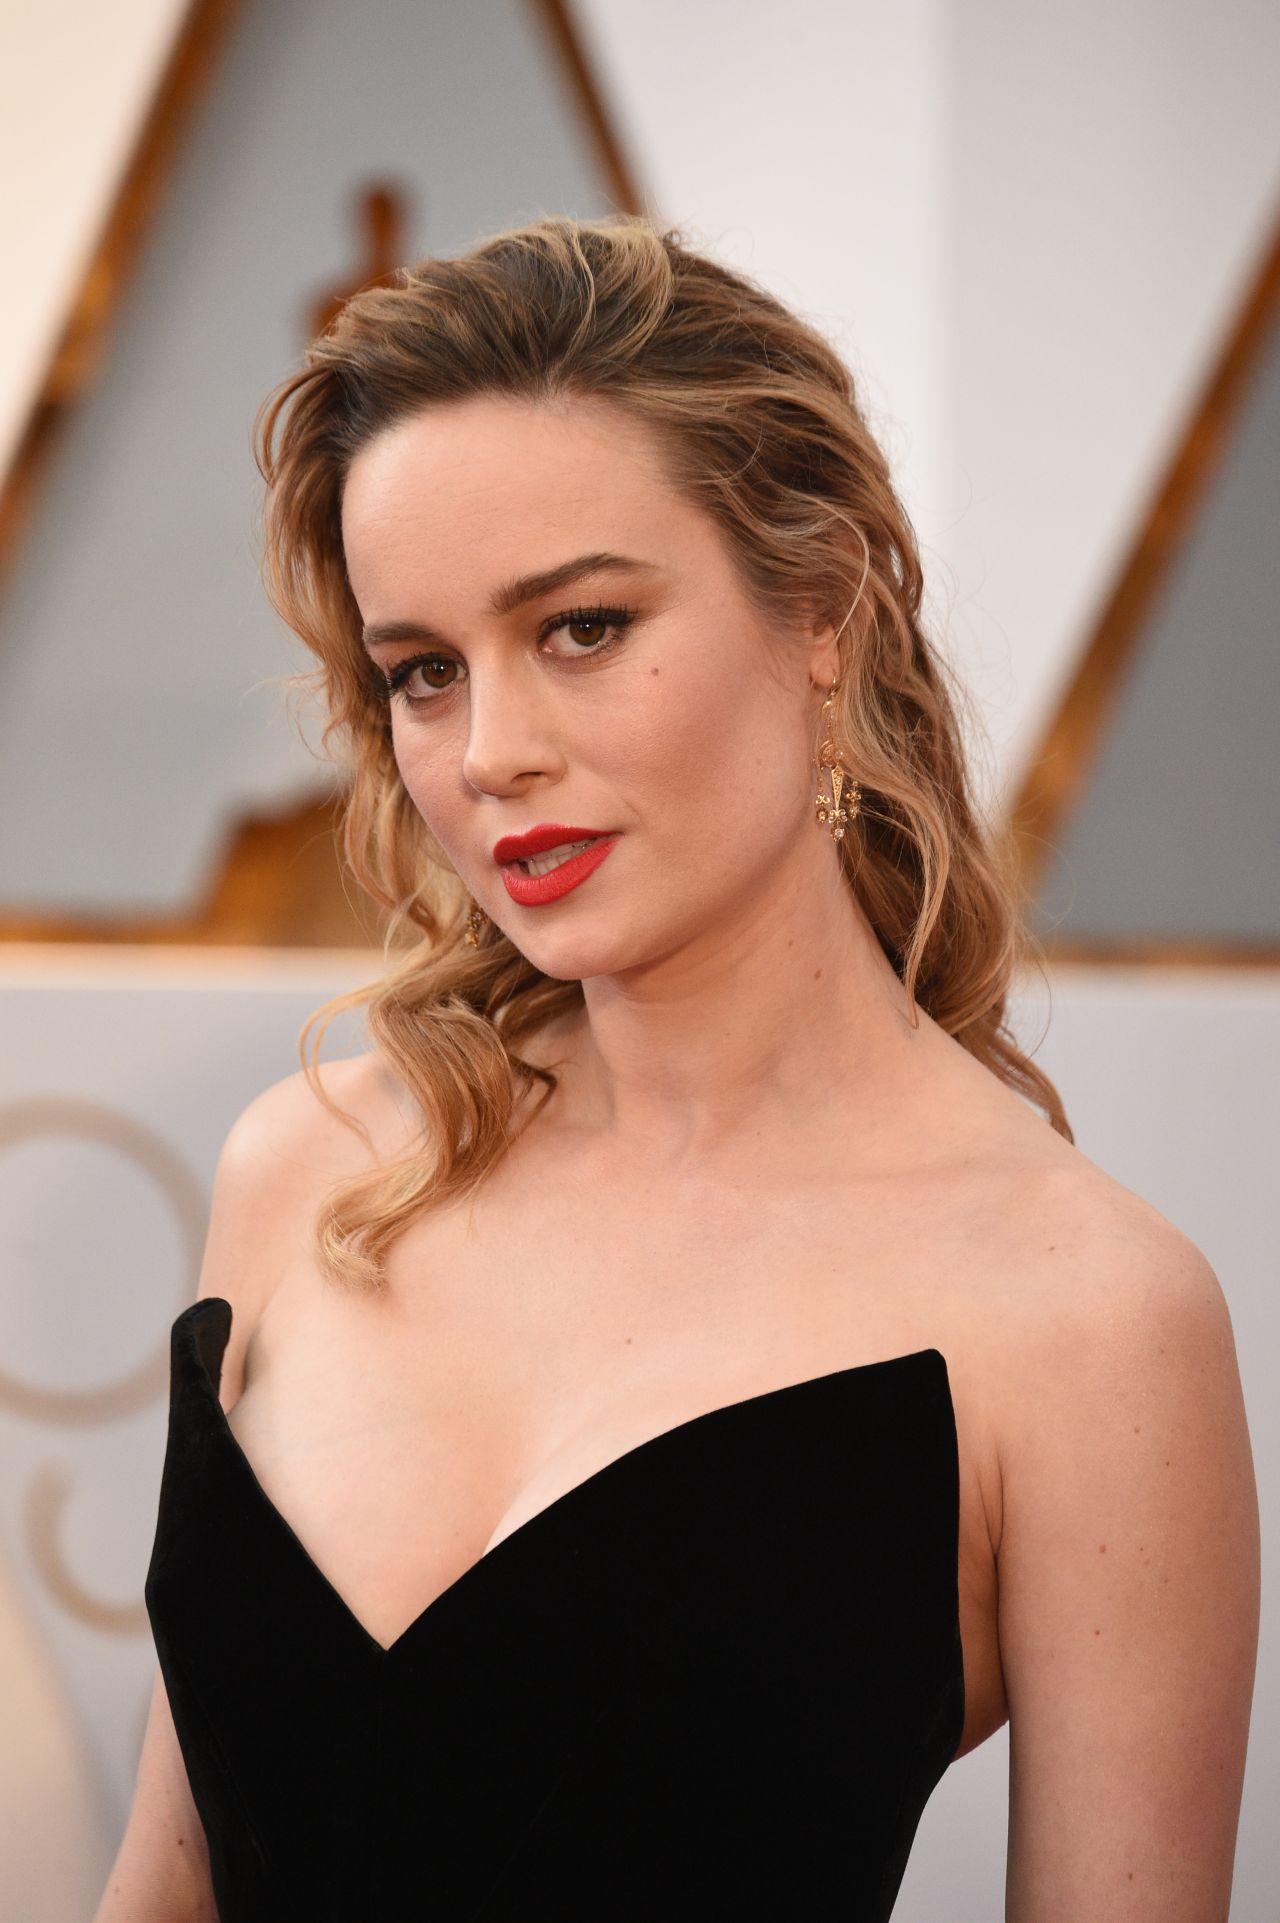 http://celebmafia.com/wp-content/uploads/2017/02/brie-larson-oscars-2017-red-carpet-in-hollywood-16.jpg